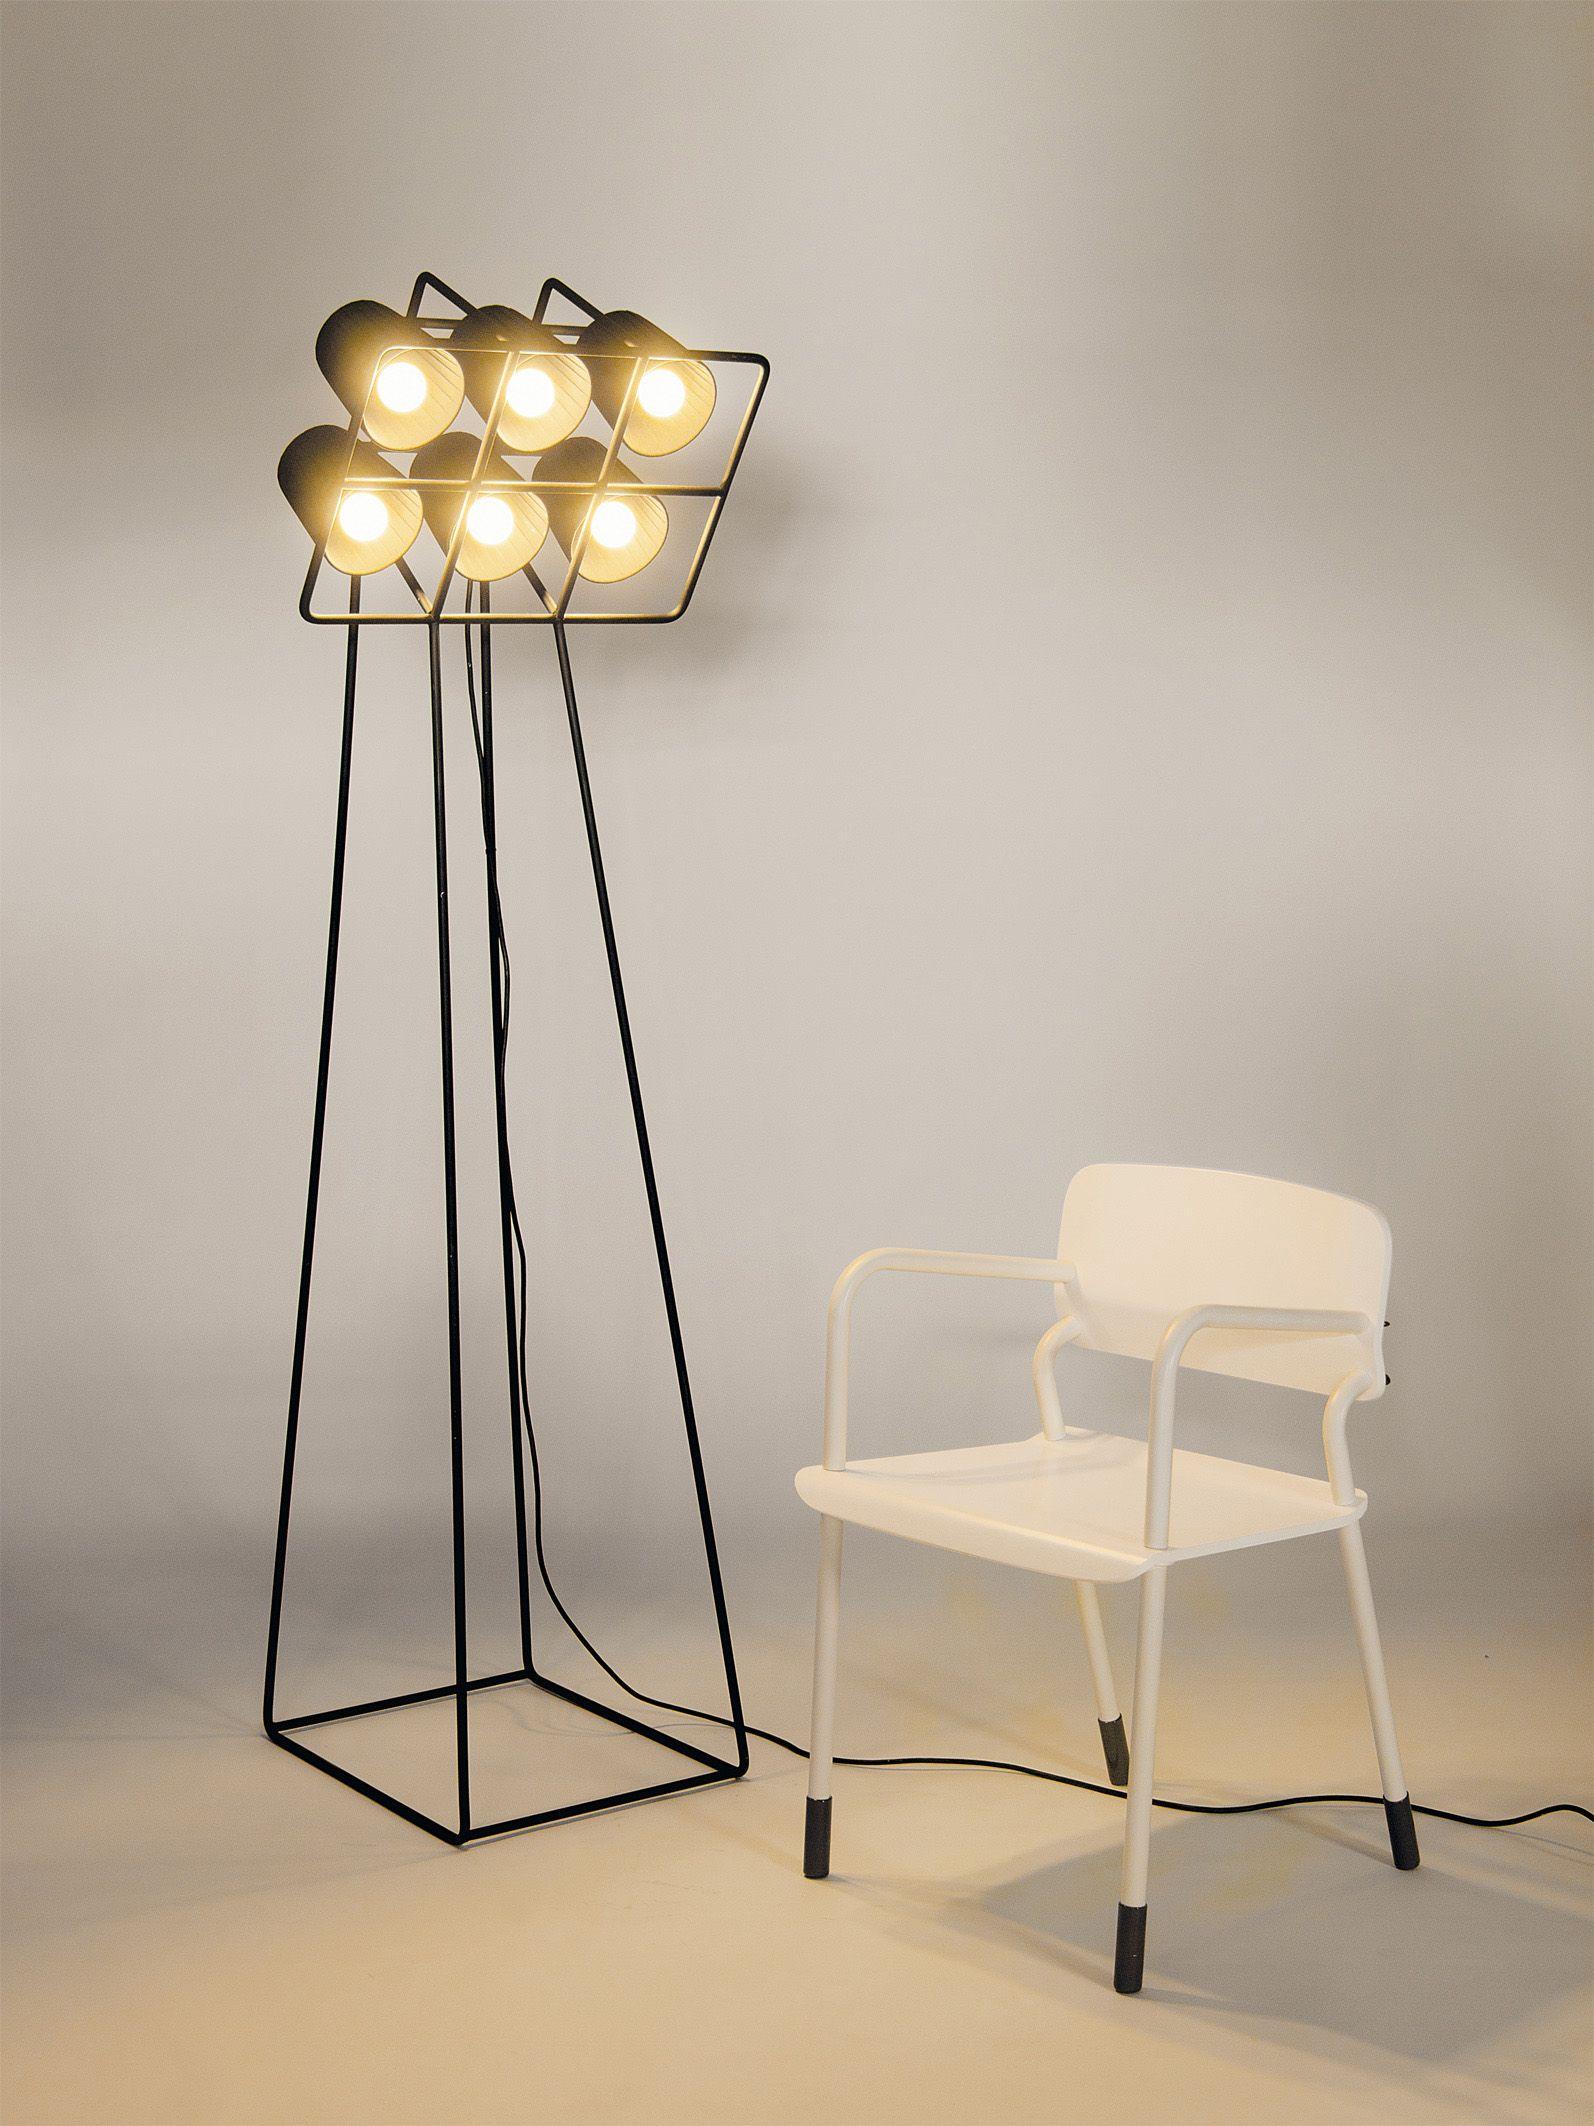 multilamp floor lamp by seletti design emanuele magini. Black Bedroom Furniture Sets. Home Design Ideas